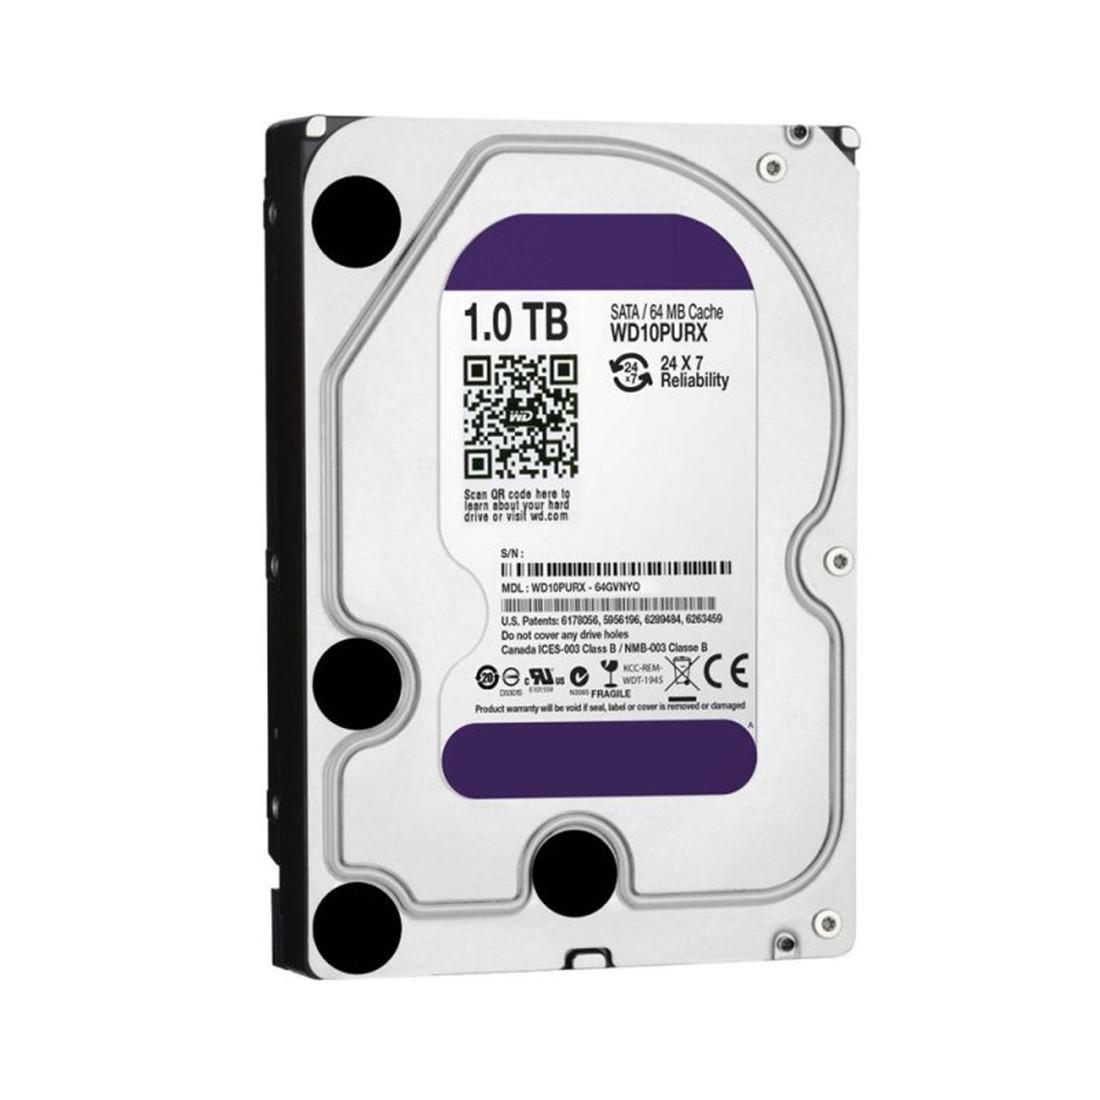 "Жесткий диск, Dahua, WD10PURX, HDD 1Tb, SATA 6Gb/s, 3.5"""